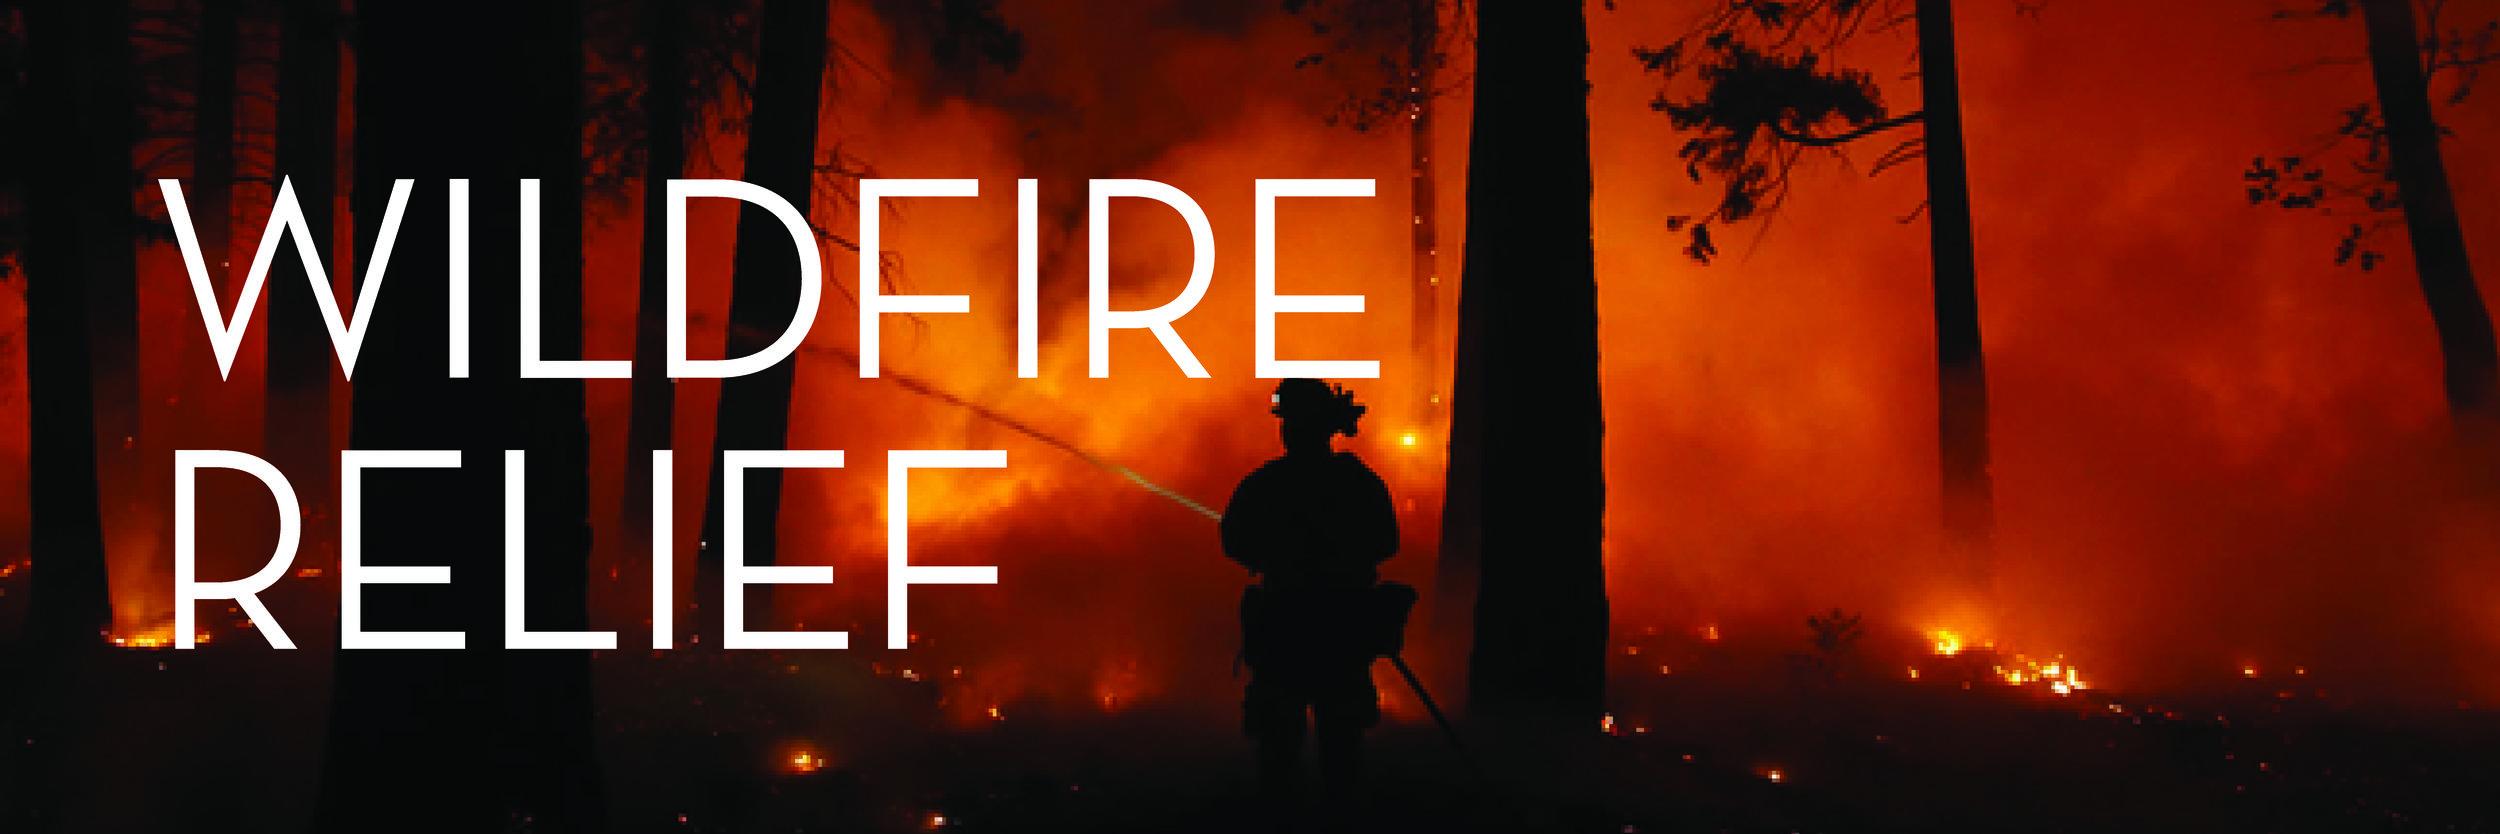 Wildfire Relief 1.jpg